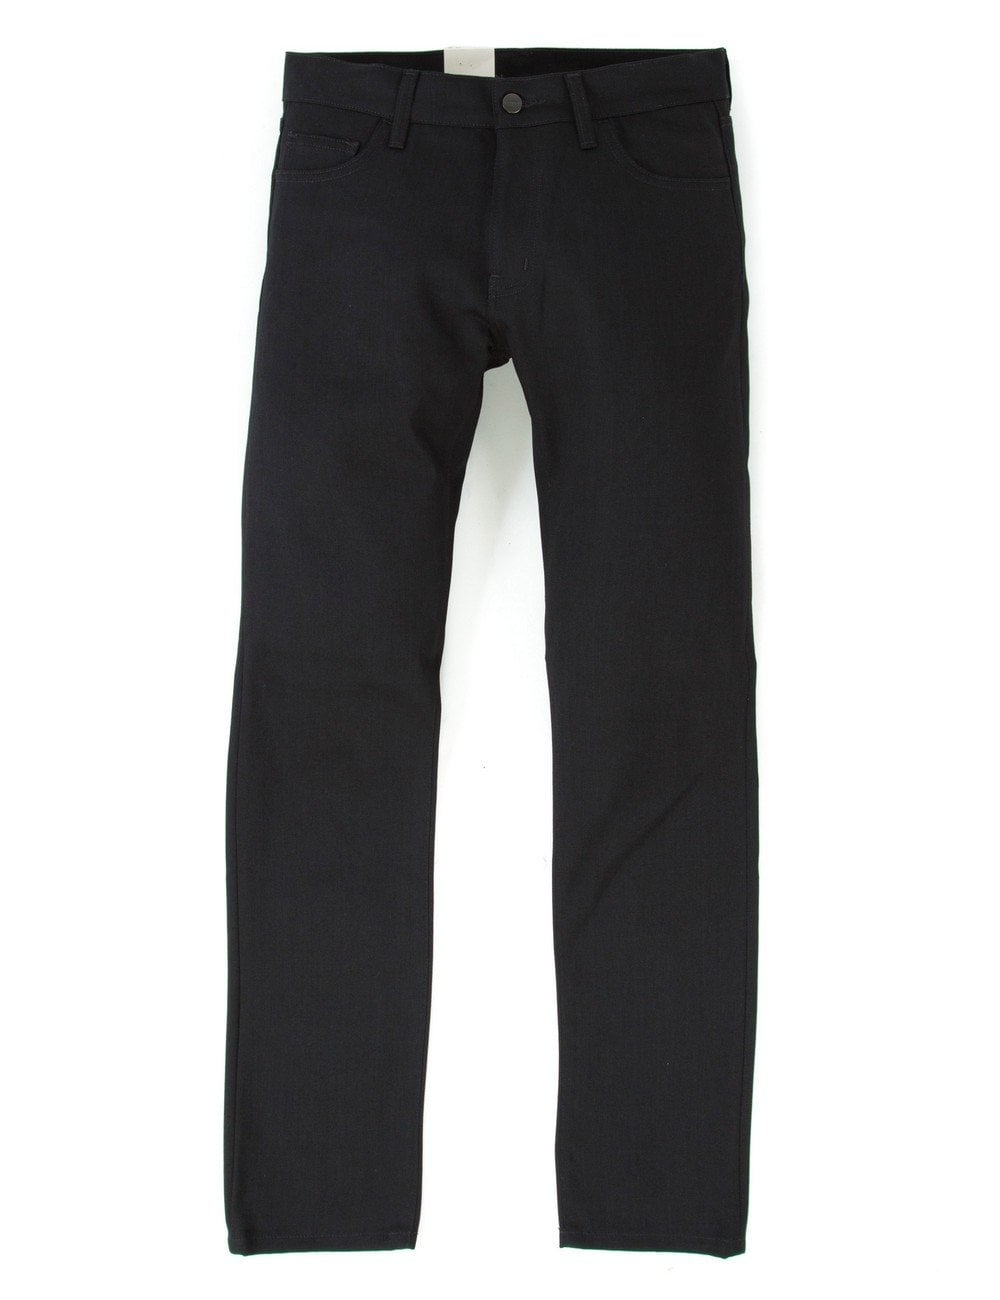 abb44d40 Carhartt WIP Rebel Pant - Black Rigid (Towner Denim) - Clothing from ...